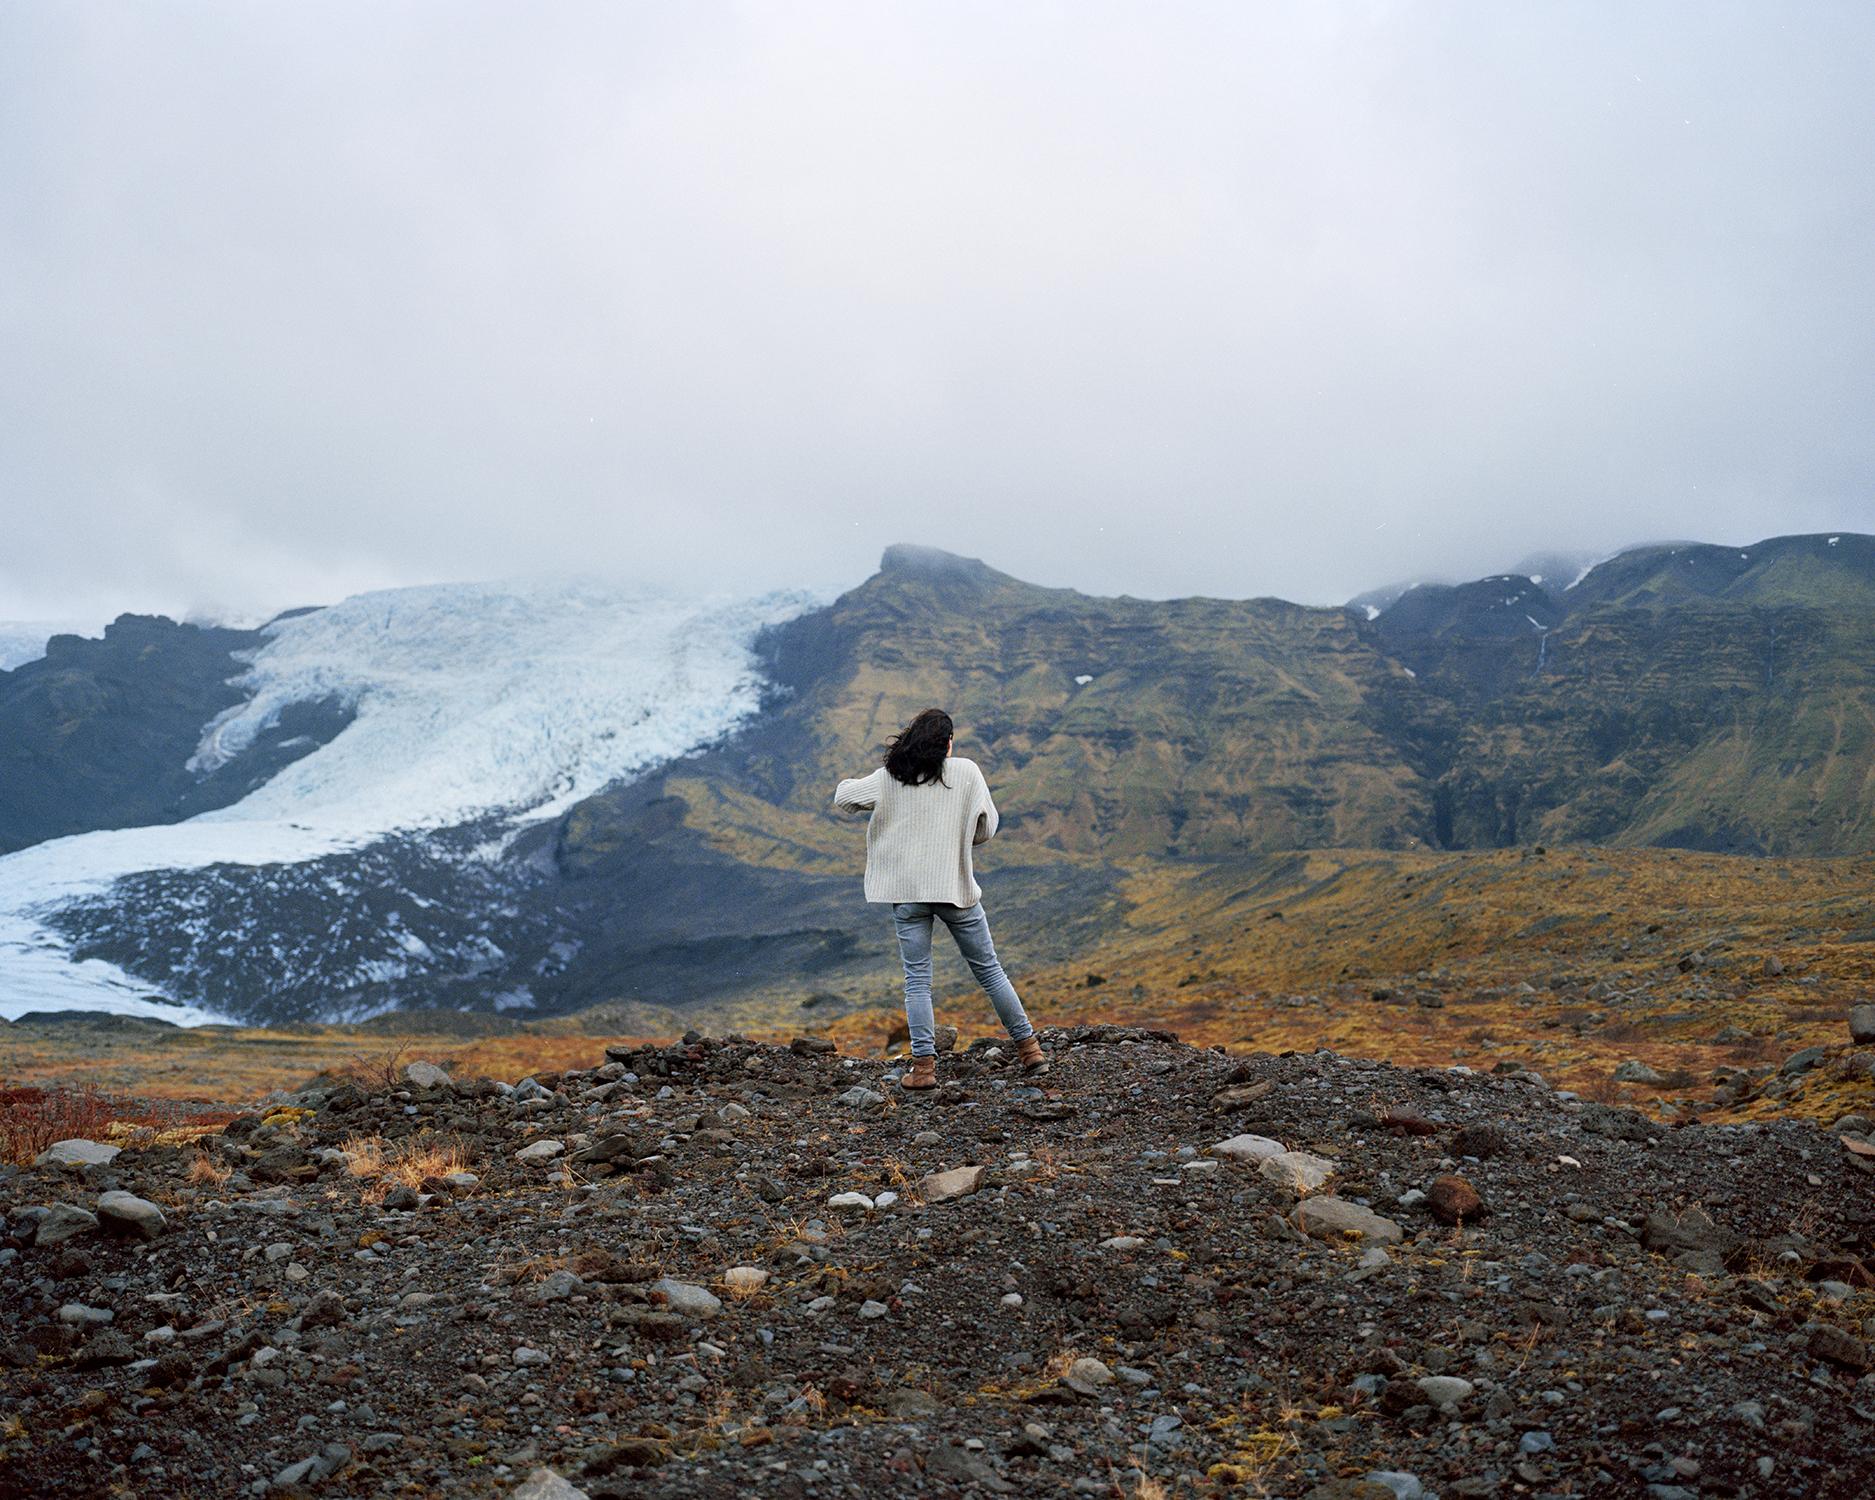 Iceland_001 006 copy.jpg